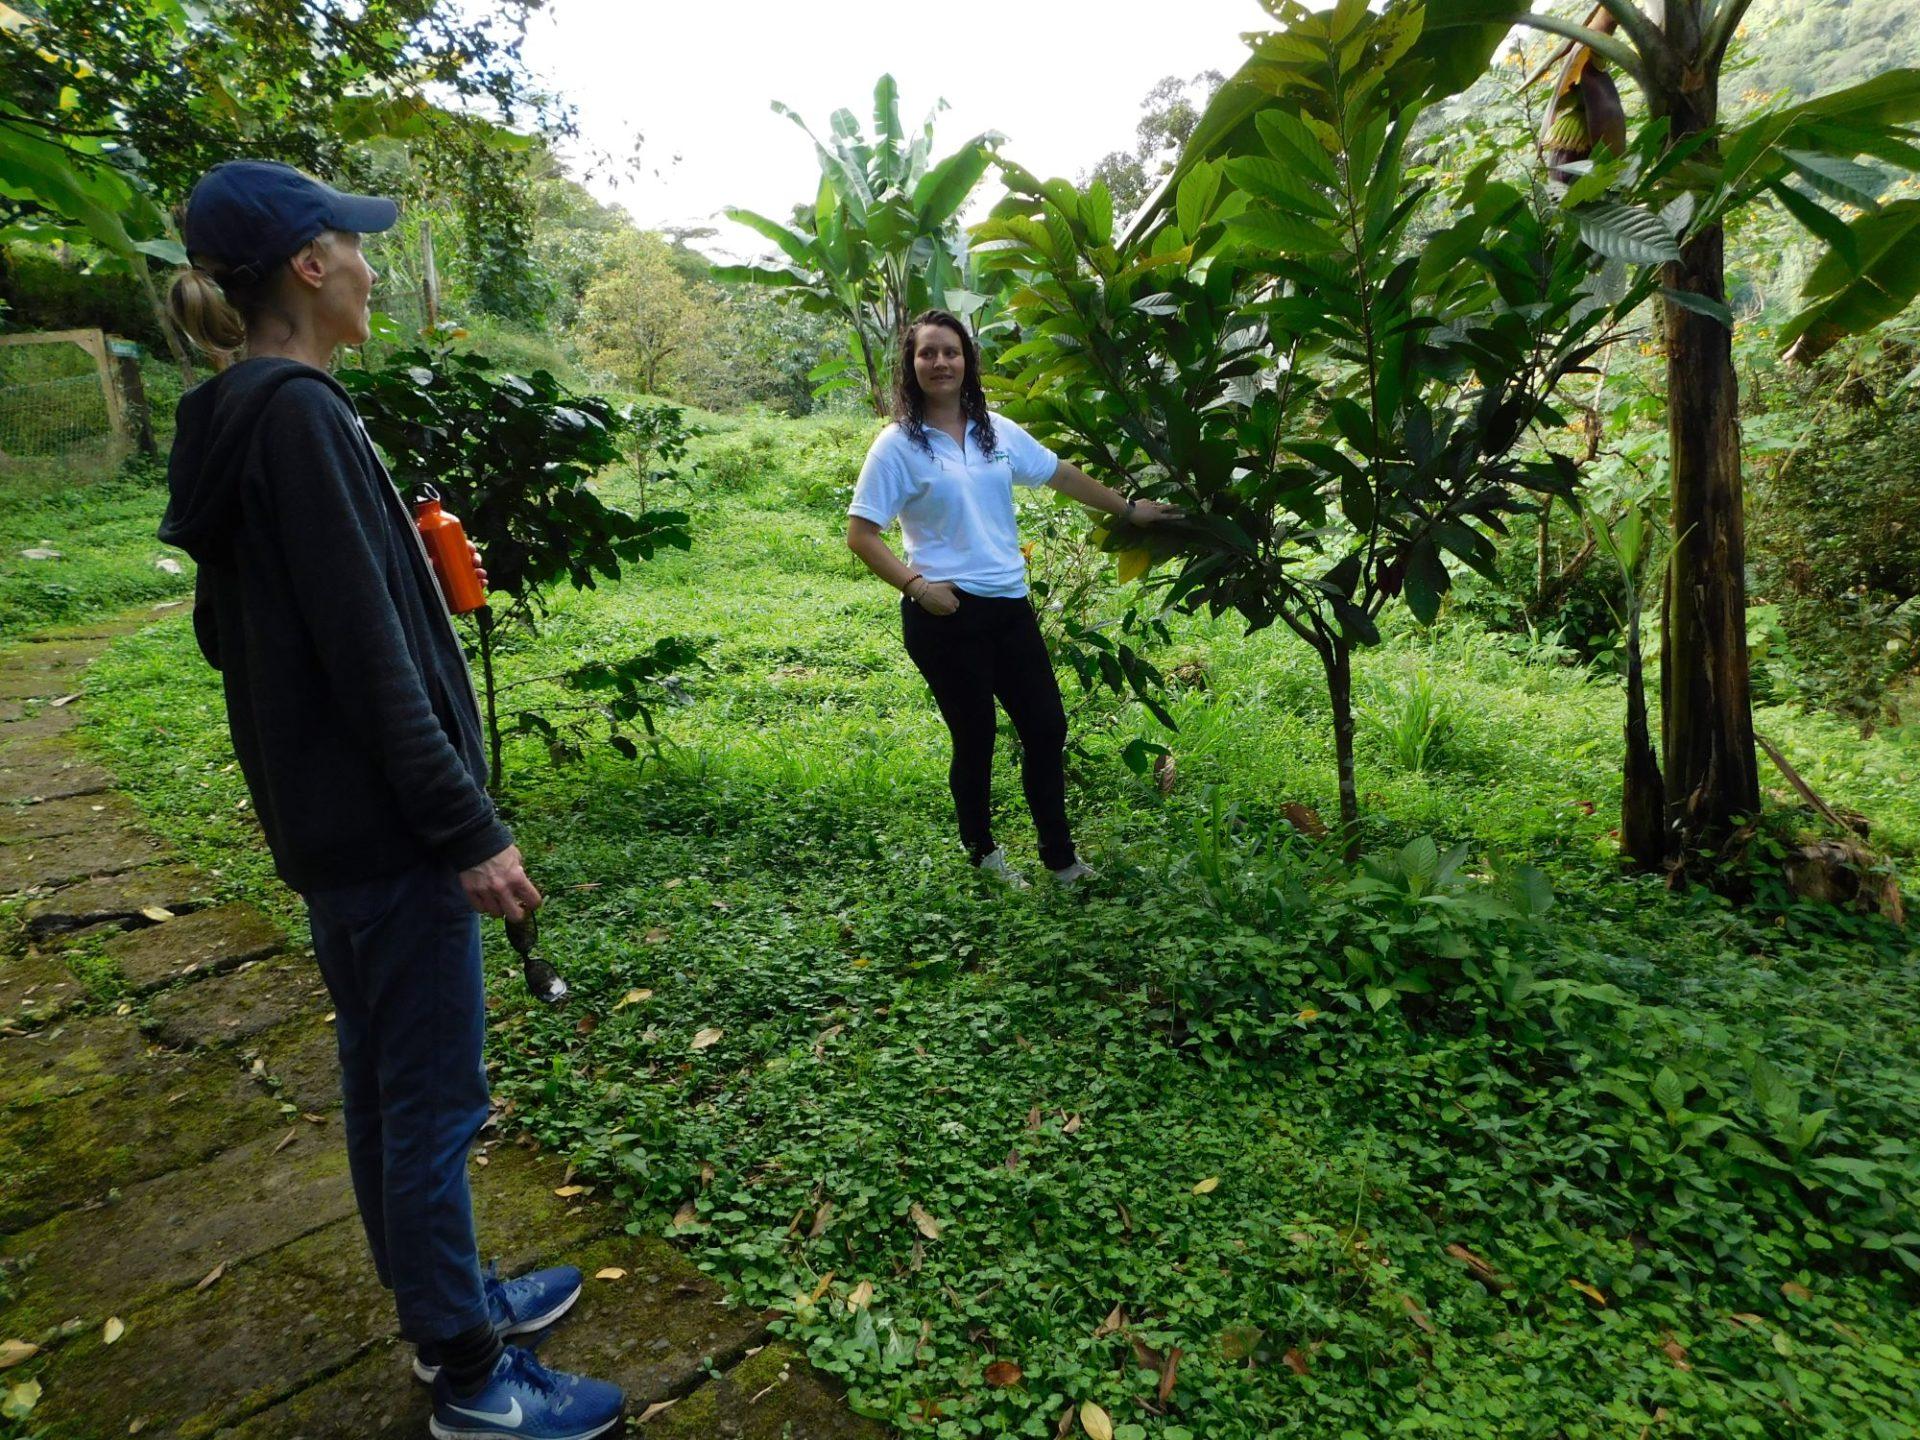 wp-content/uploads/itineraries/Costa-Rica/Day3OTGRanchoMargotfarmtour.jpg